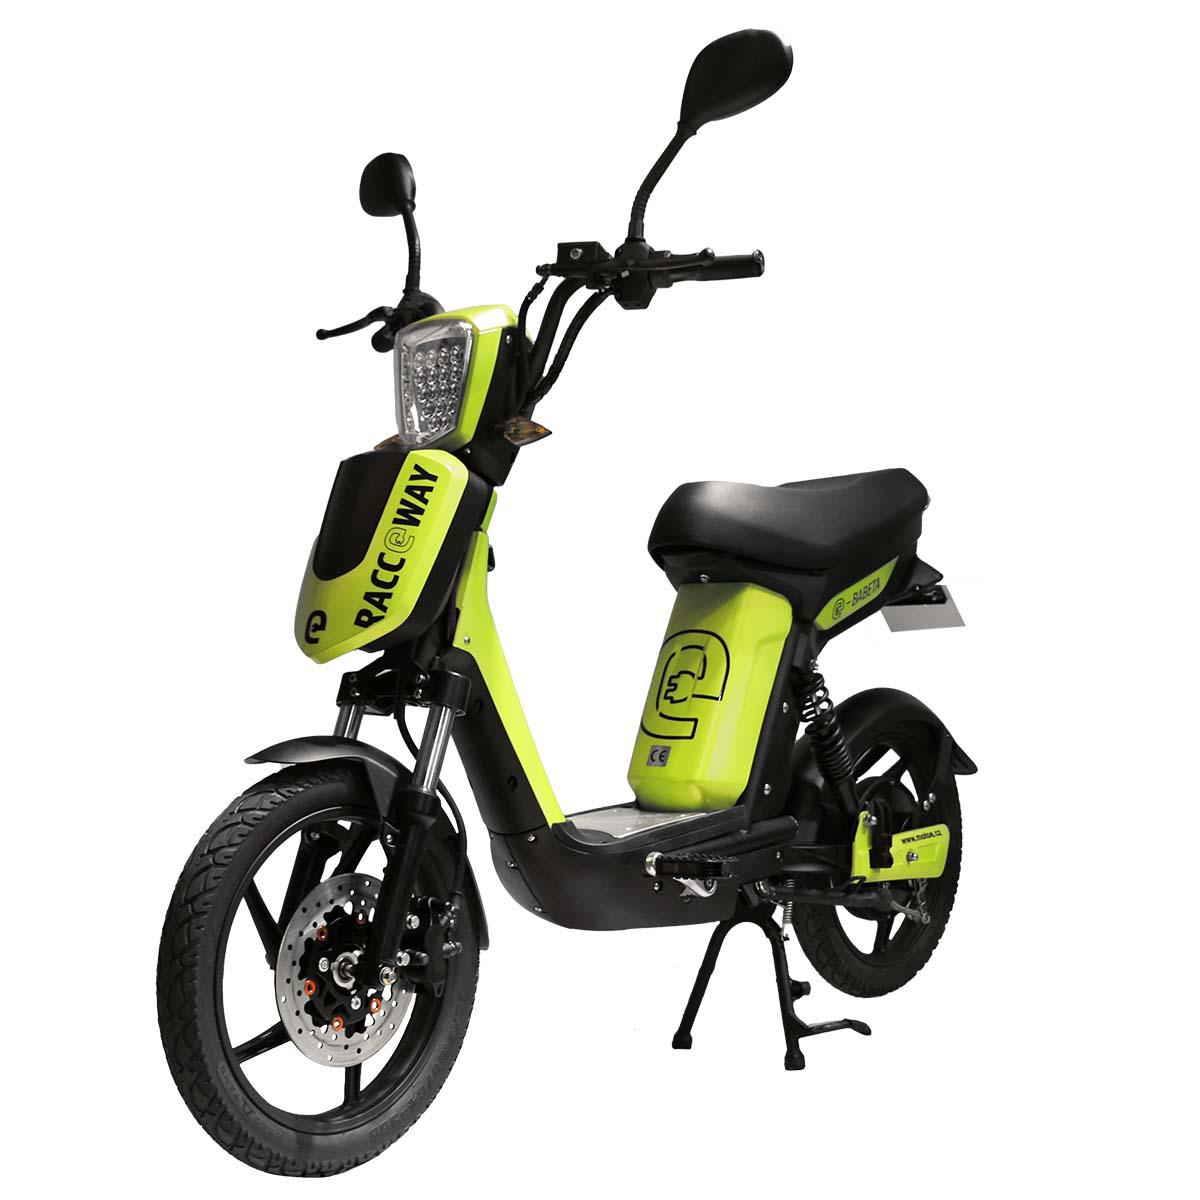 Elektrický motocykl RACCEWAY E-BABETA Barva: Zelená